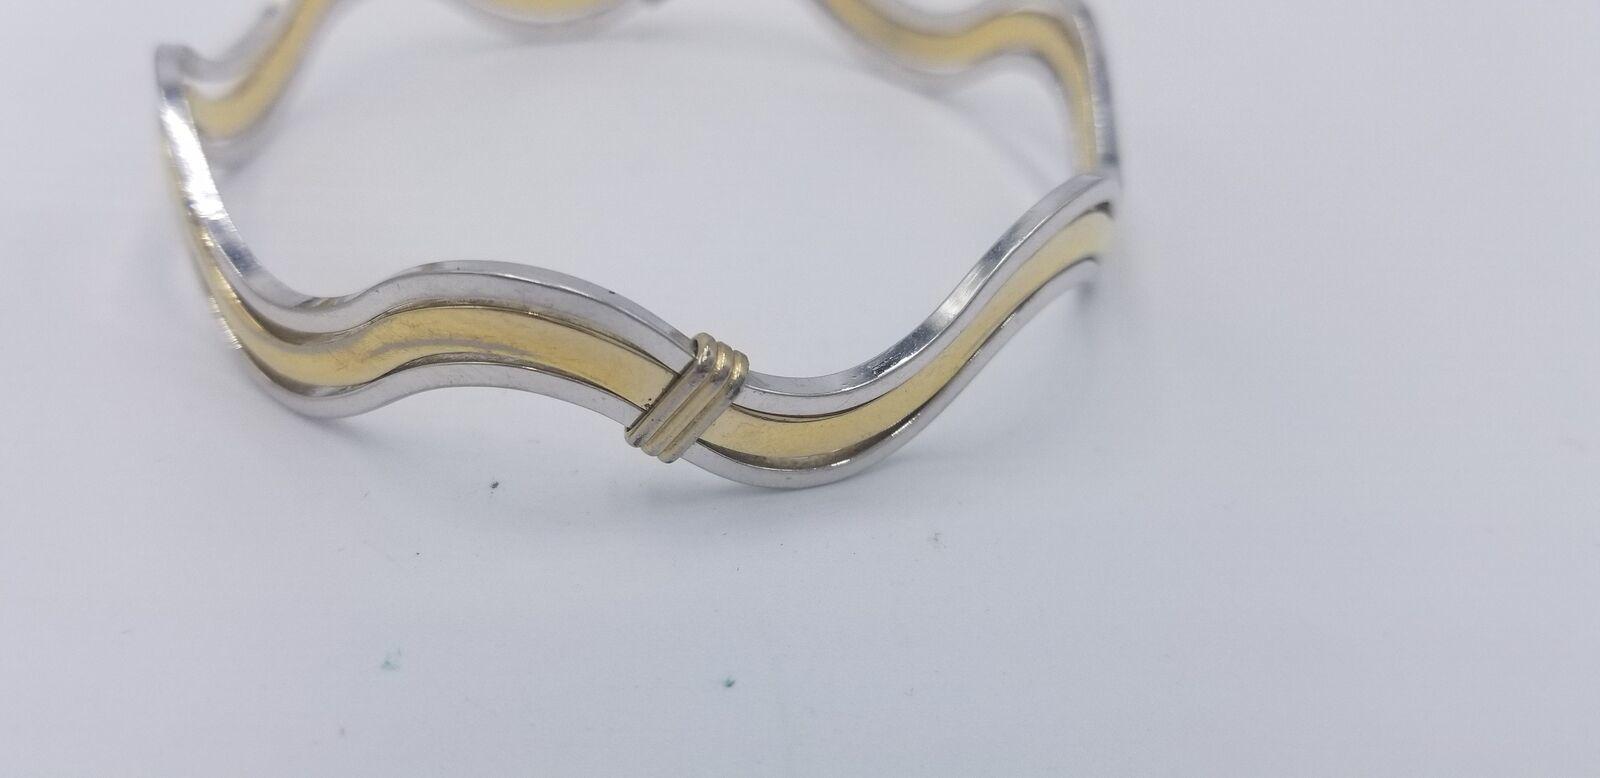 Vintage Signed Avon Silver And Gold Tone Wavy Style No Clasp Bracelet EUC image 6